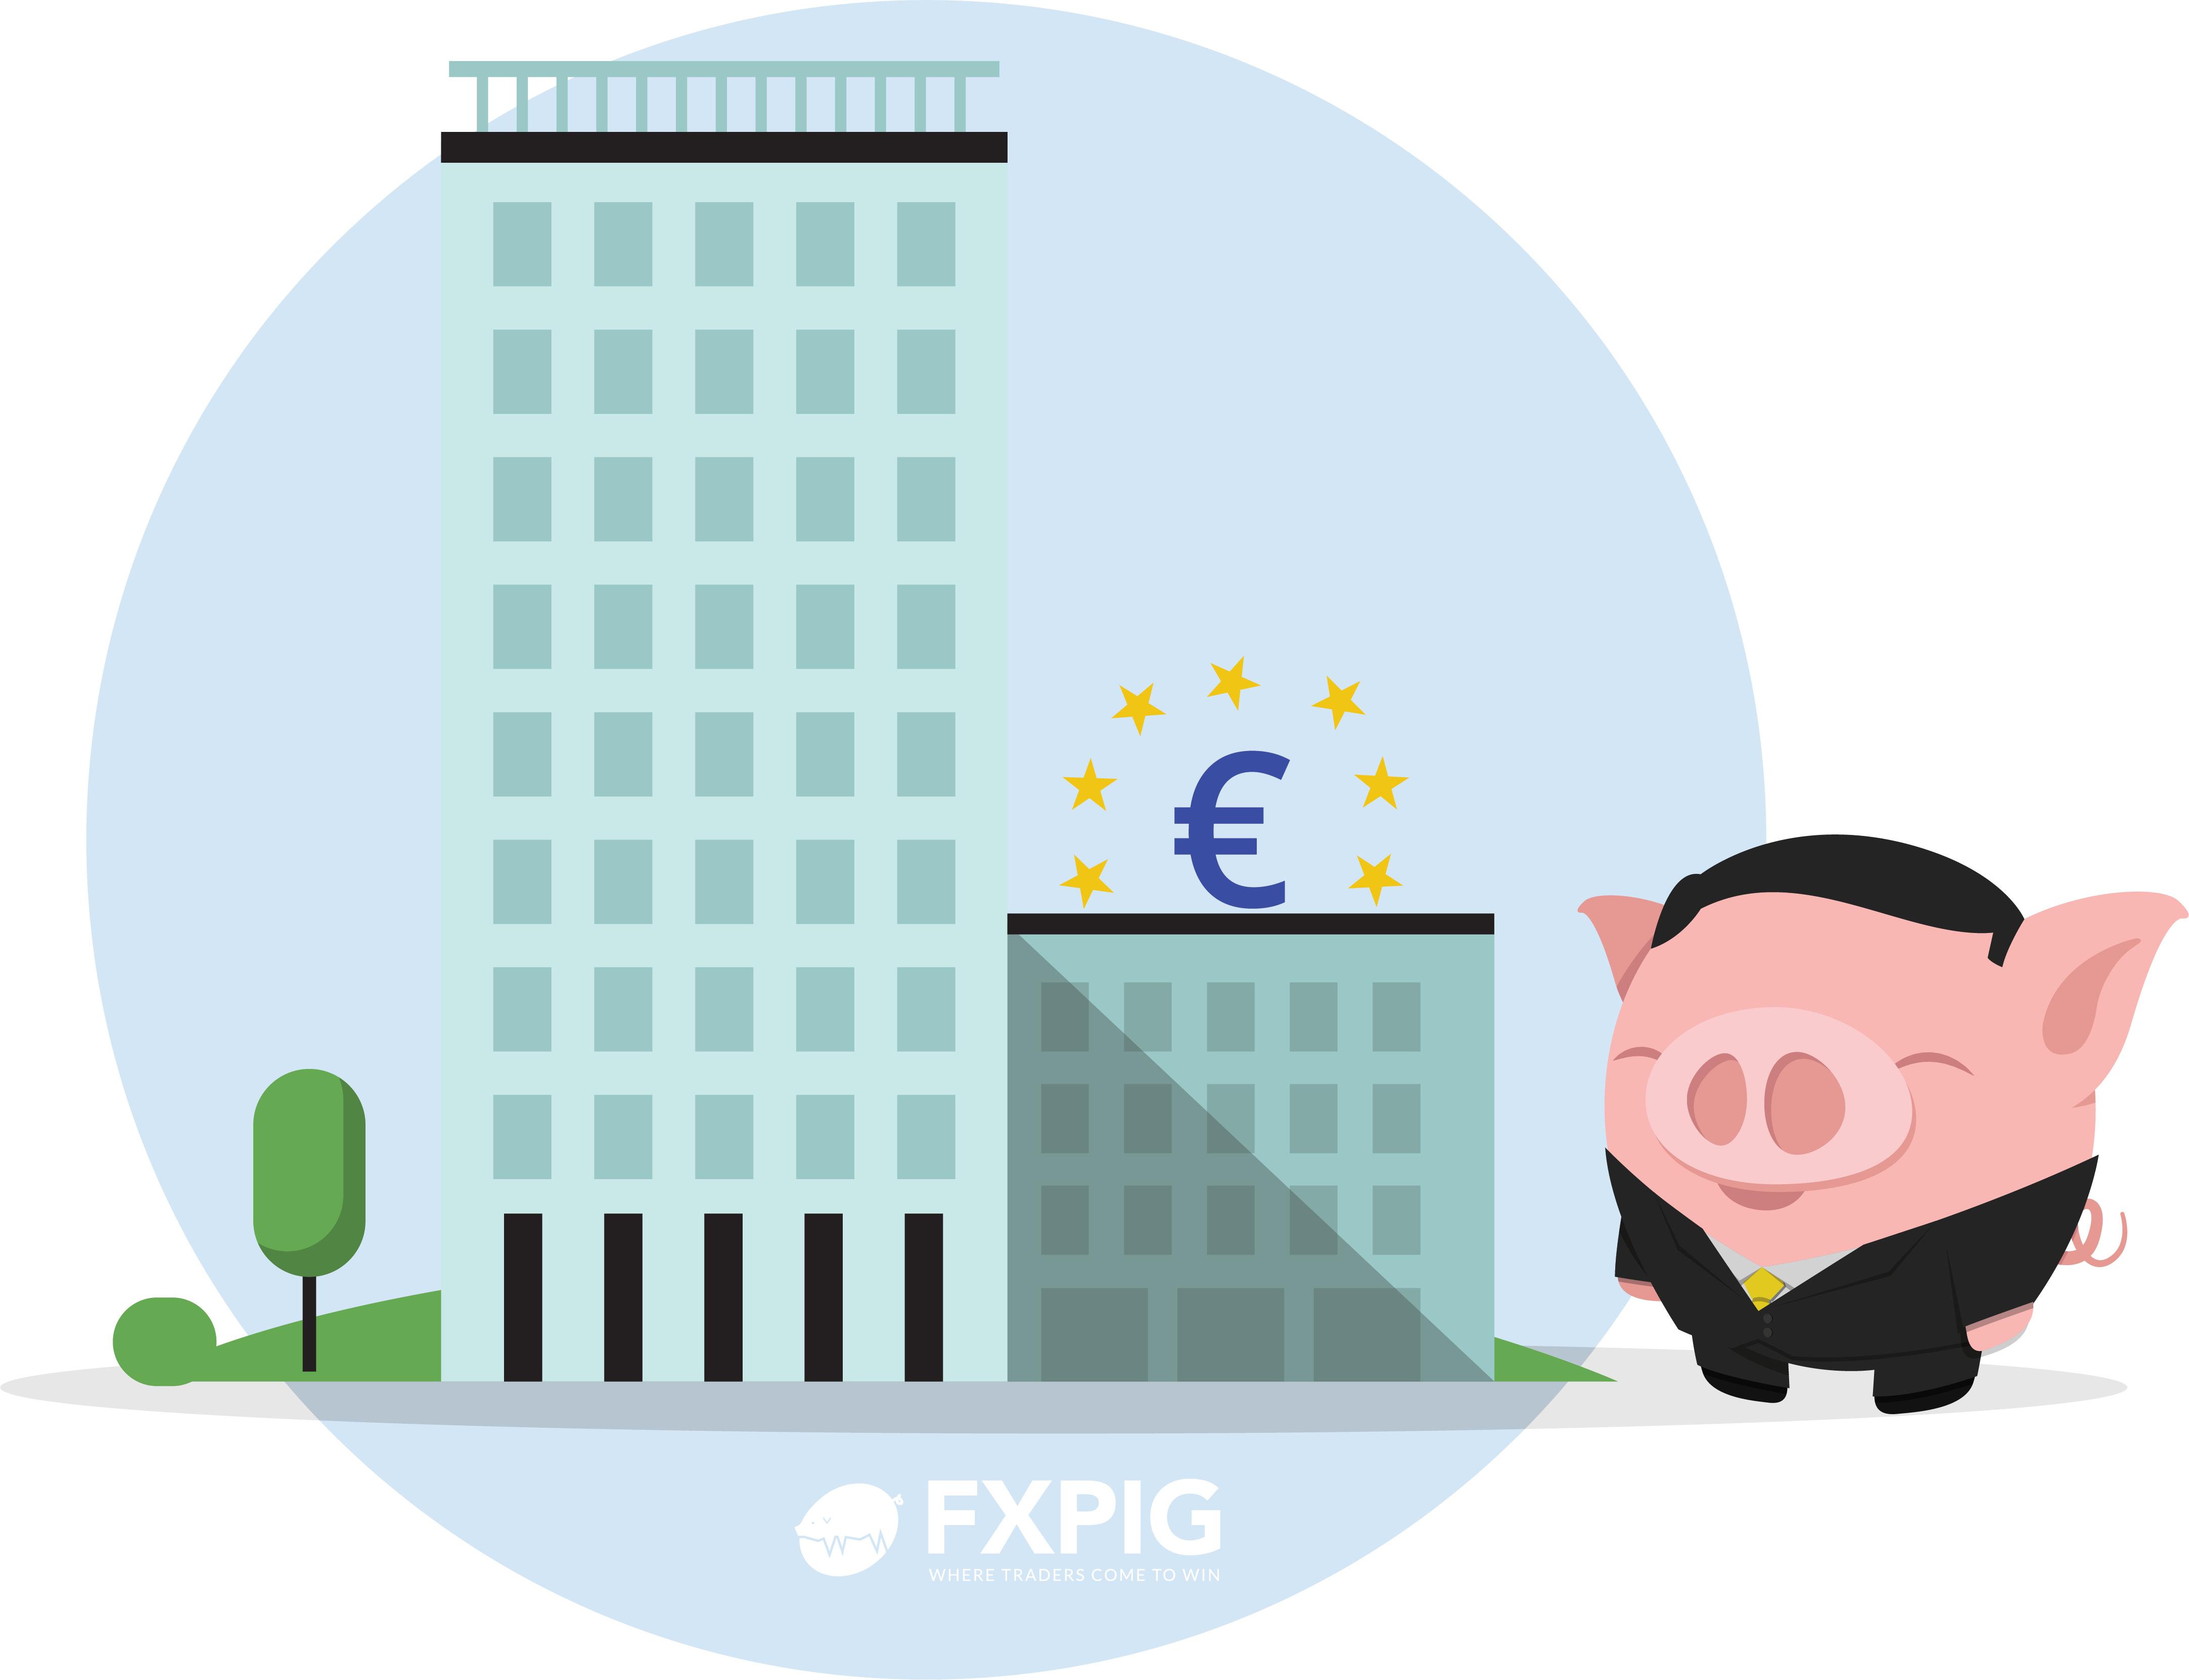 FOREXZ_ECB-key-interest-rates-remain_FXPIG